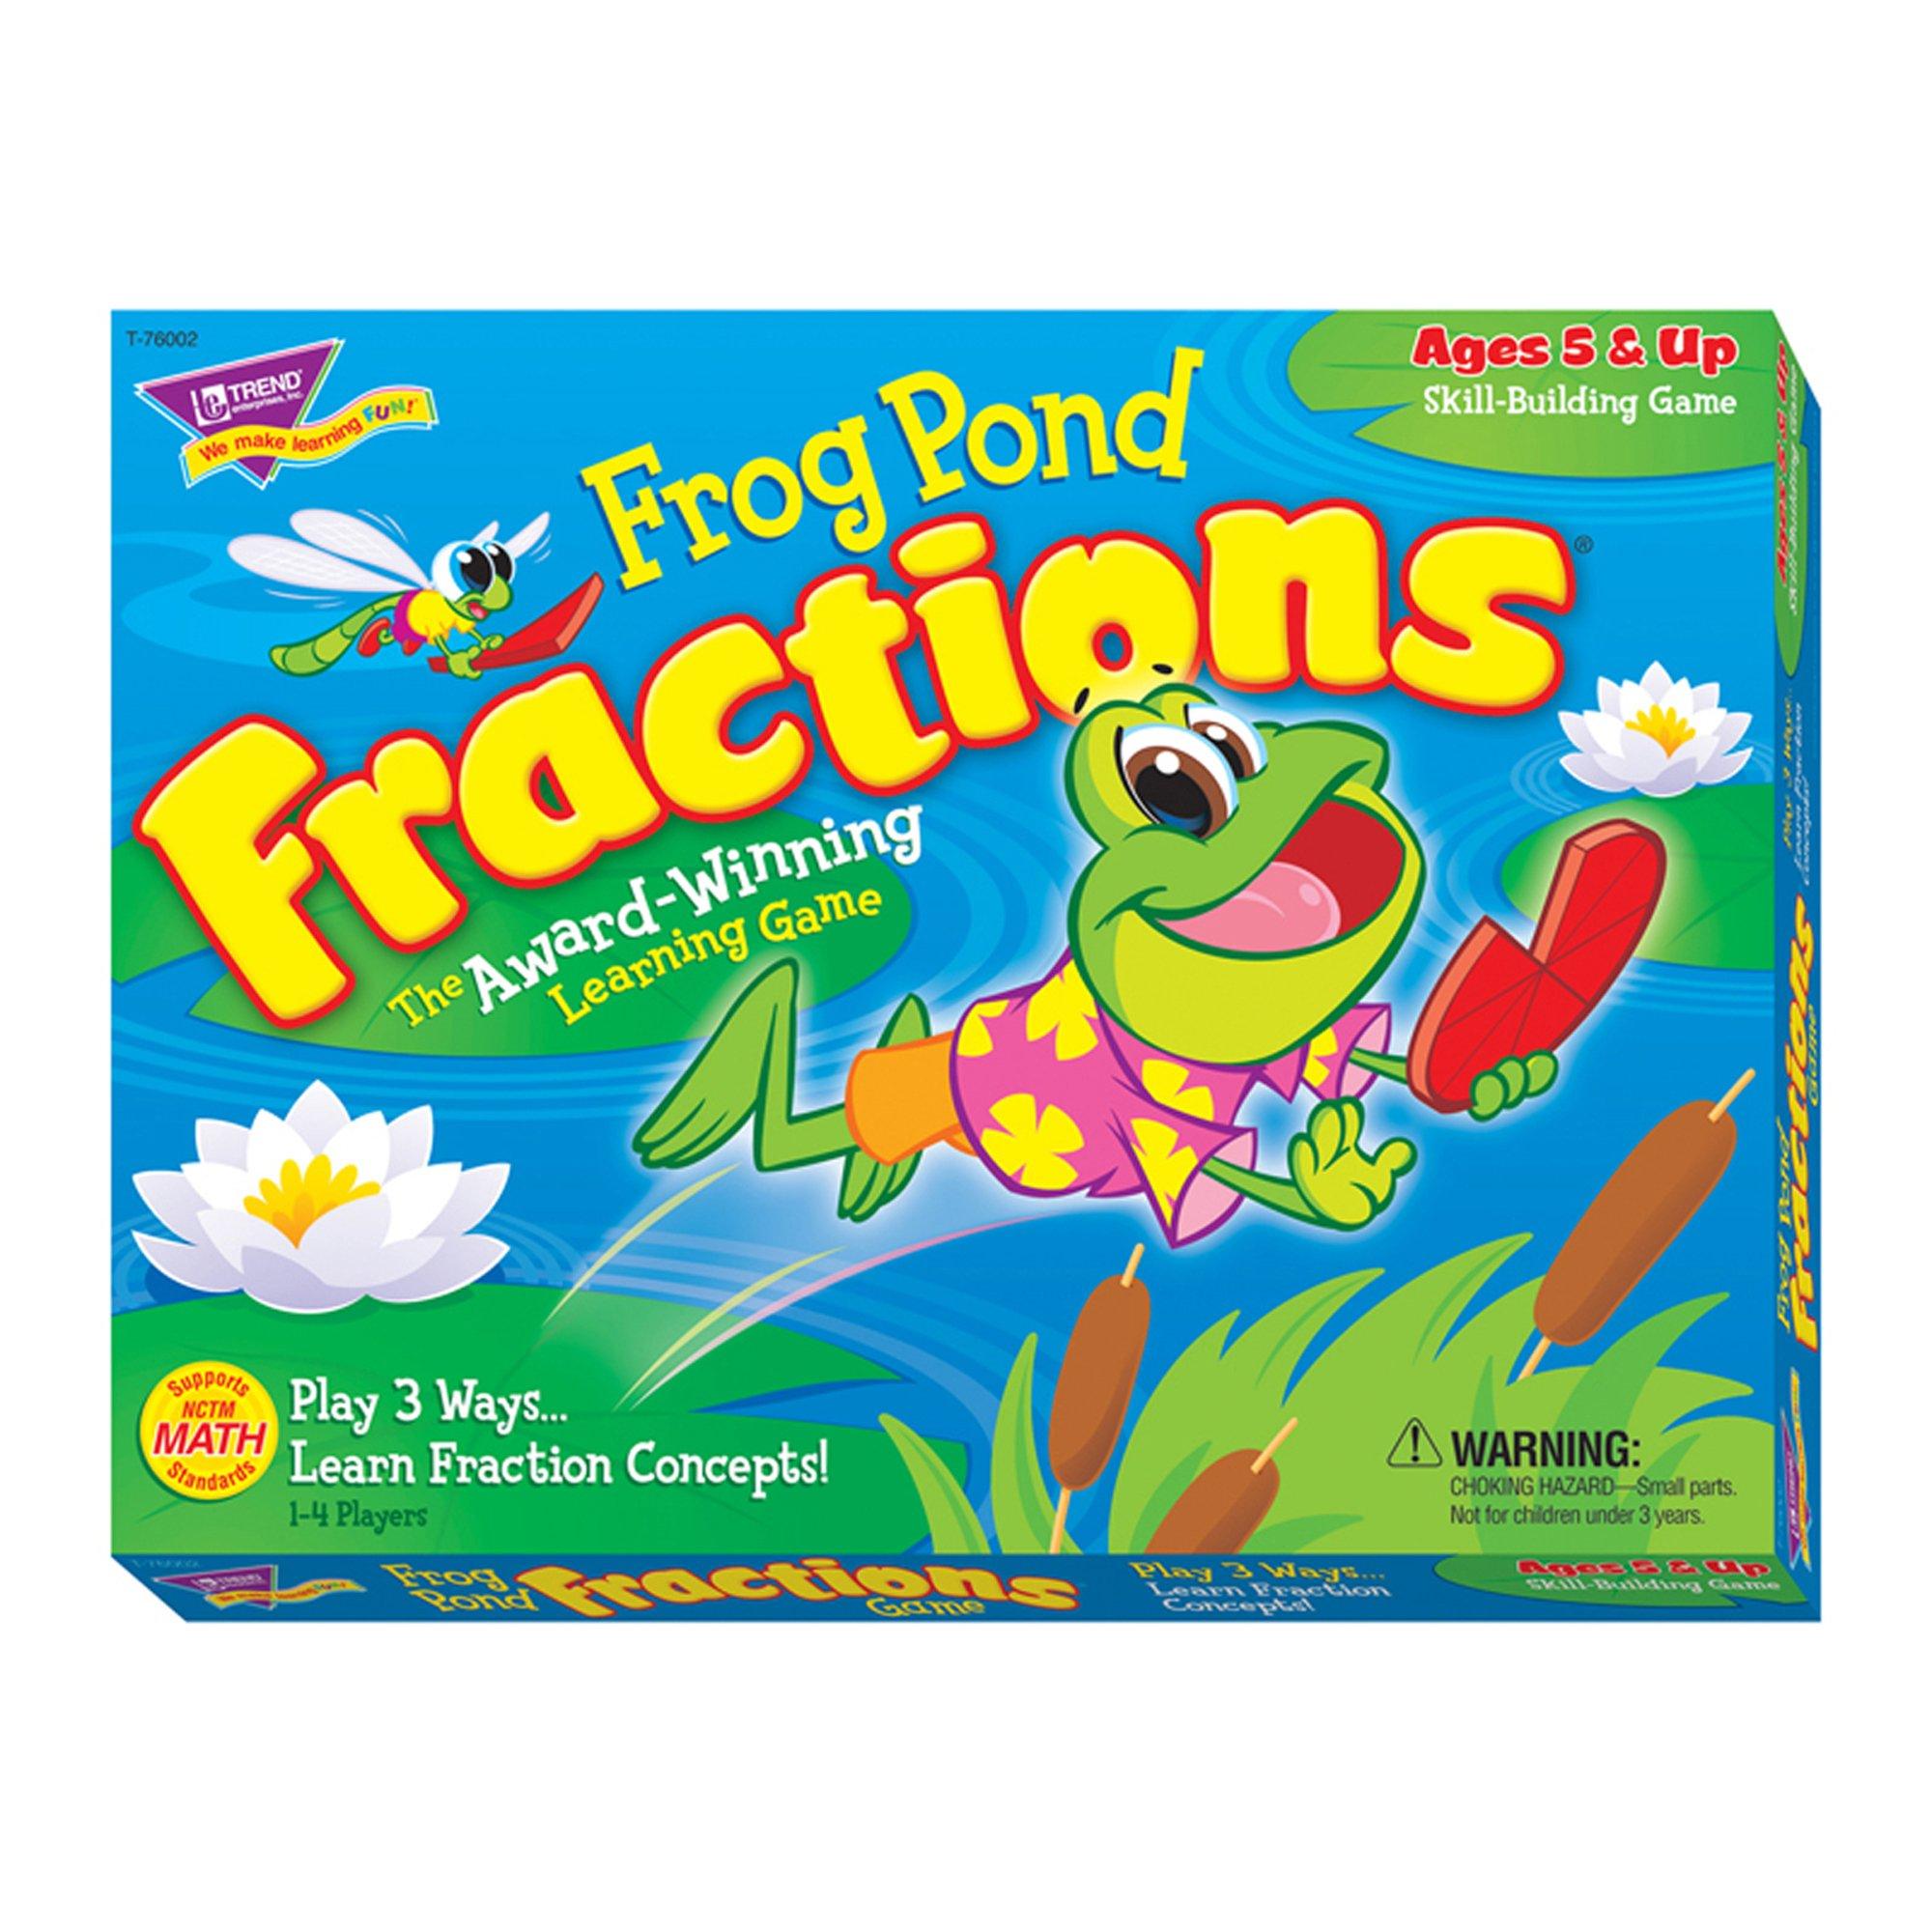 Frog Pond Fractions® Learning Game by Trend Enterprises Inc